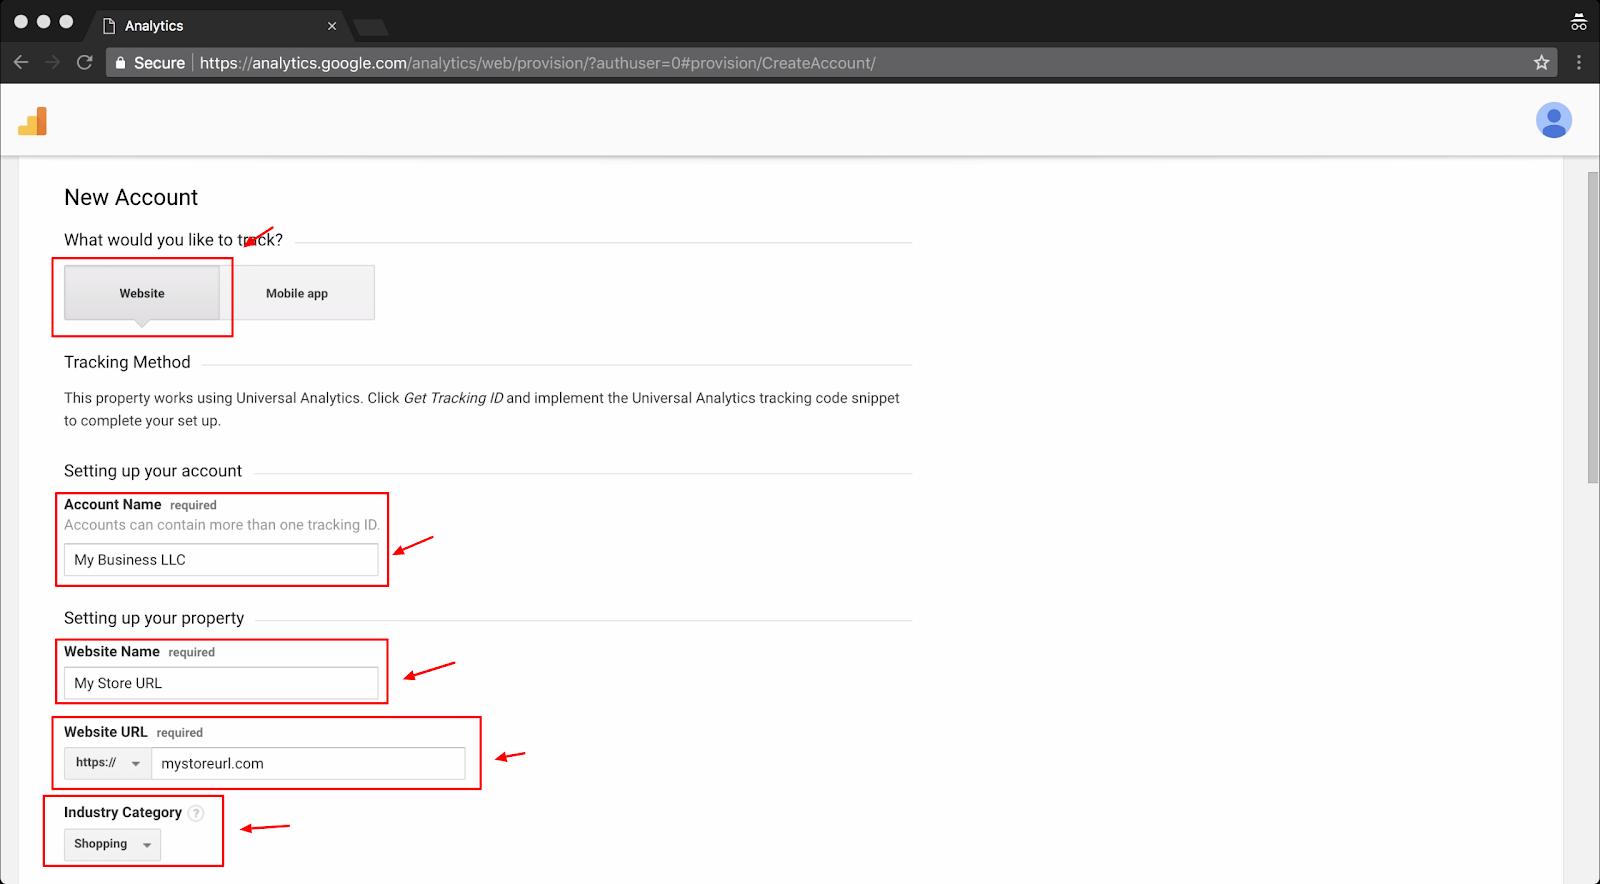 Screenshot showing google analytics settings page